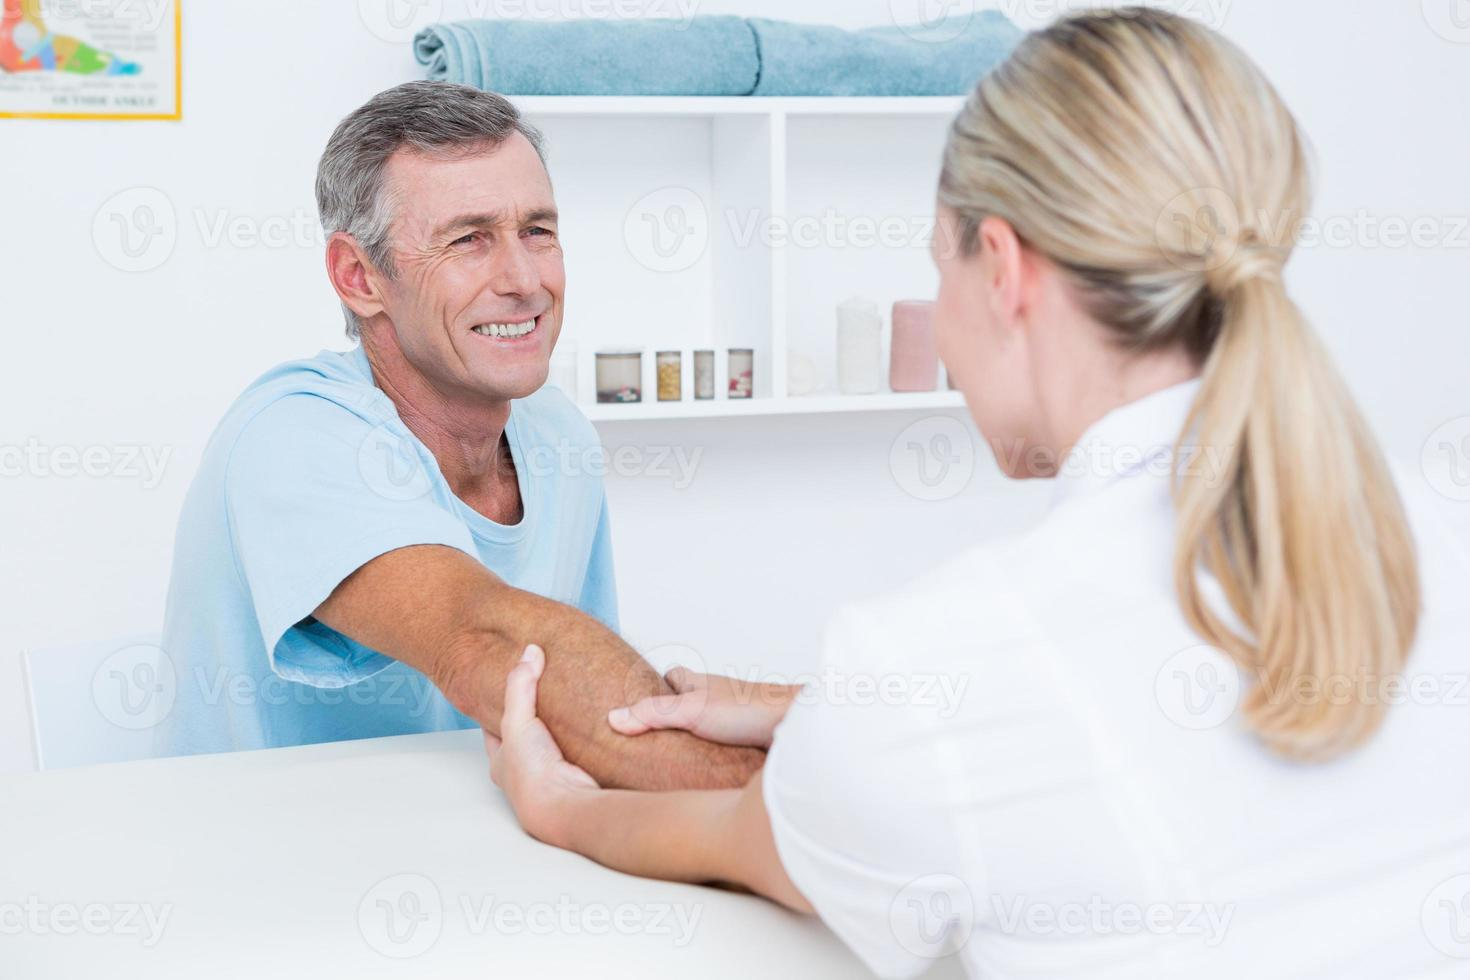 doctor haciendo masaje de brazo foto